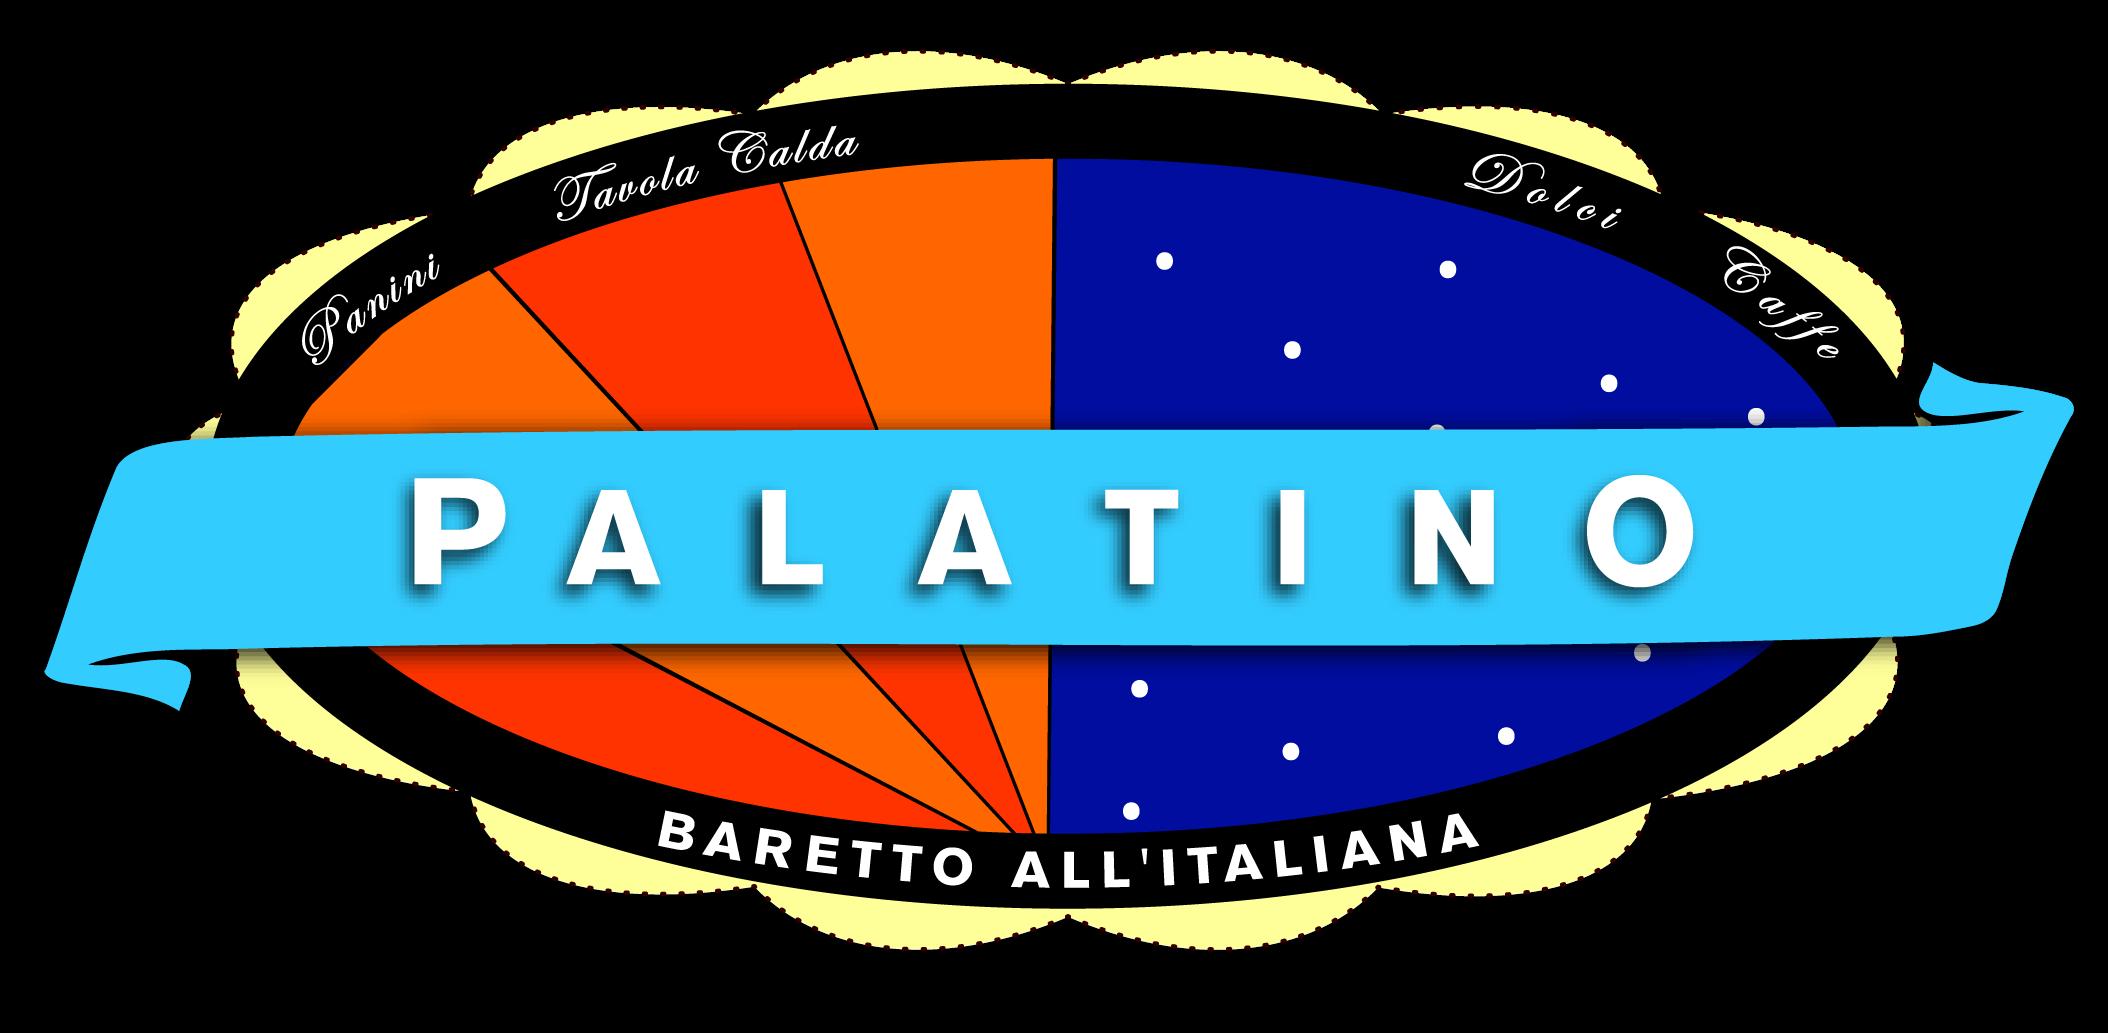 Palatino Logo.png